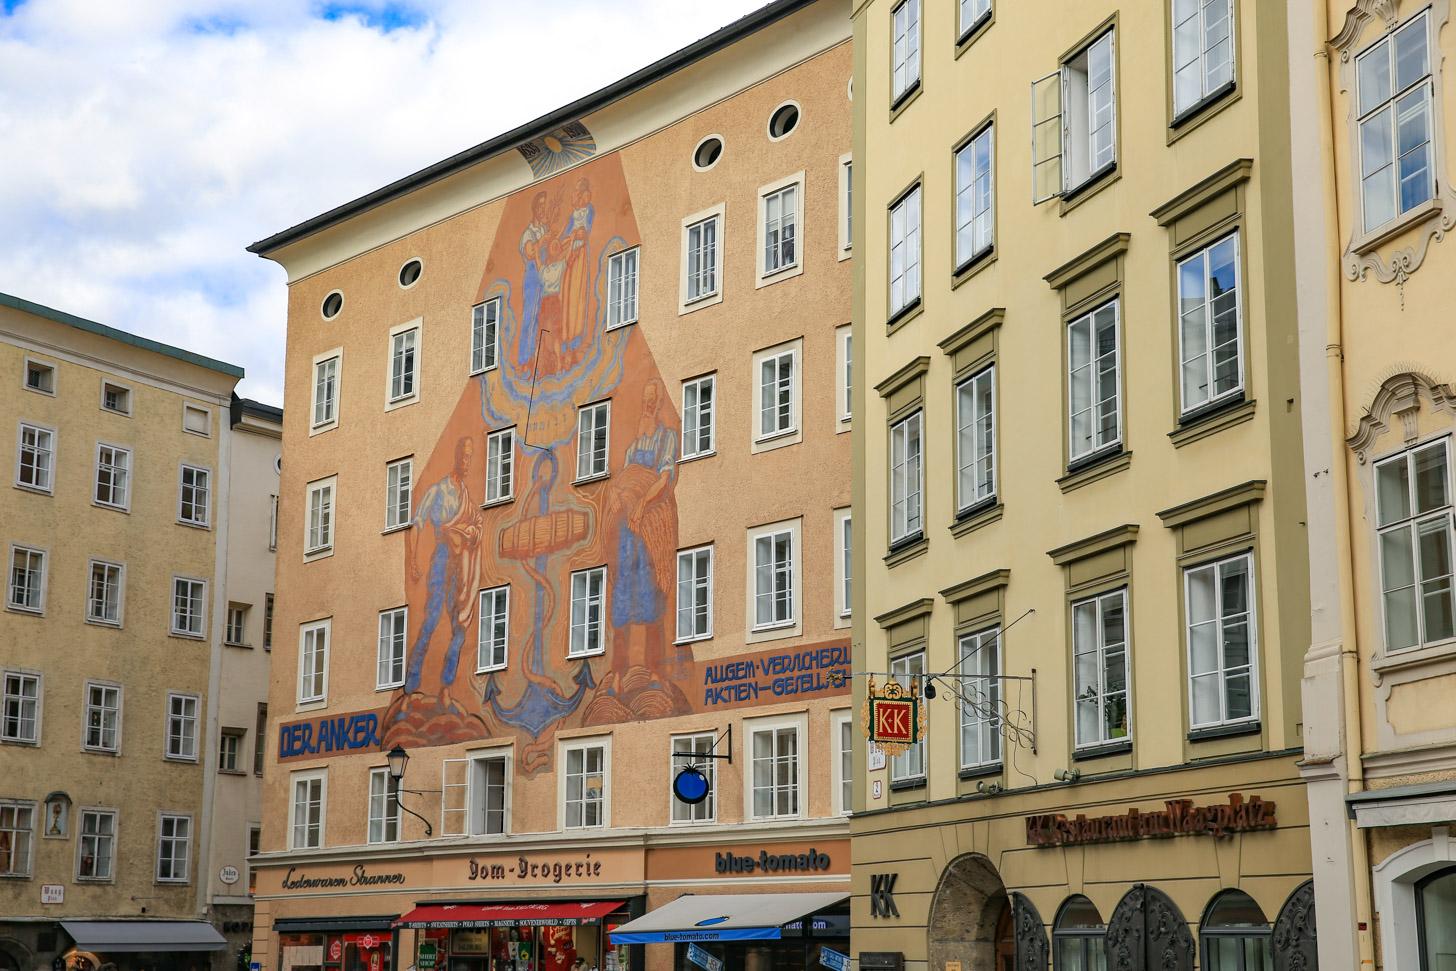 Oude binnenstad van Salzburg